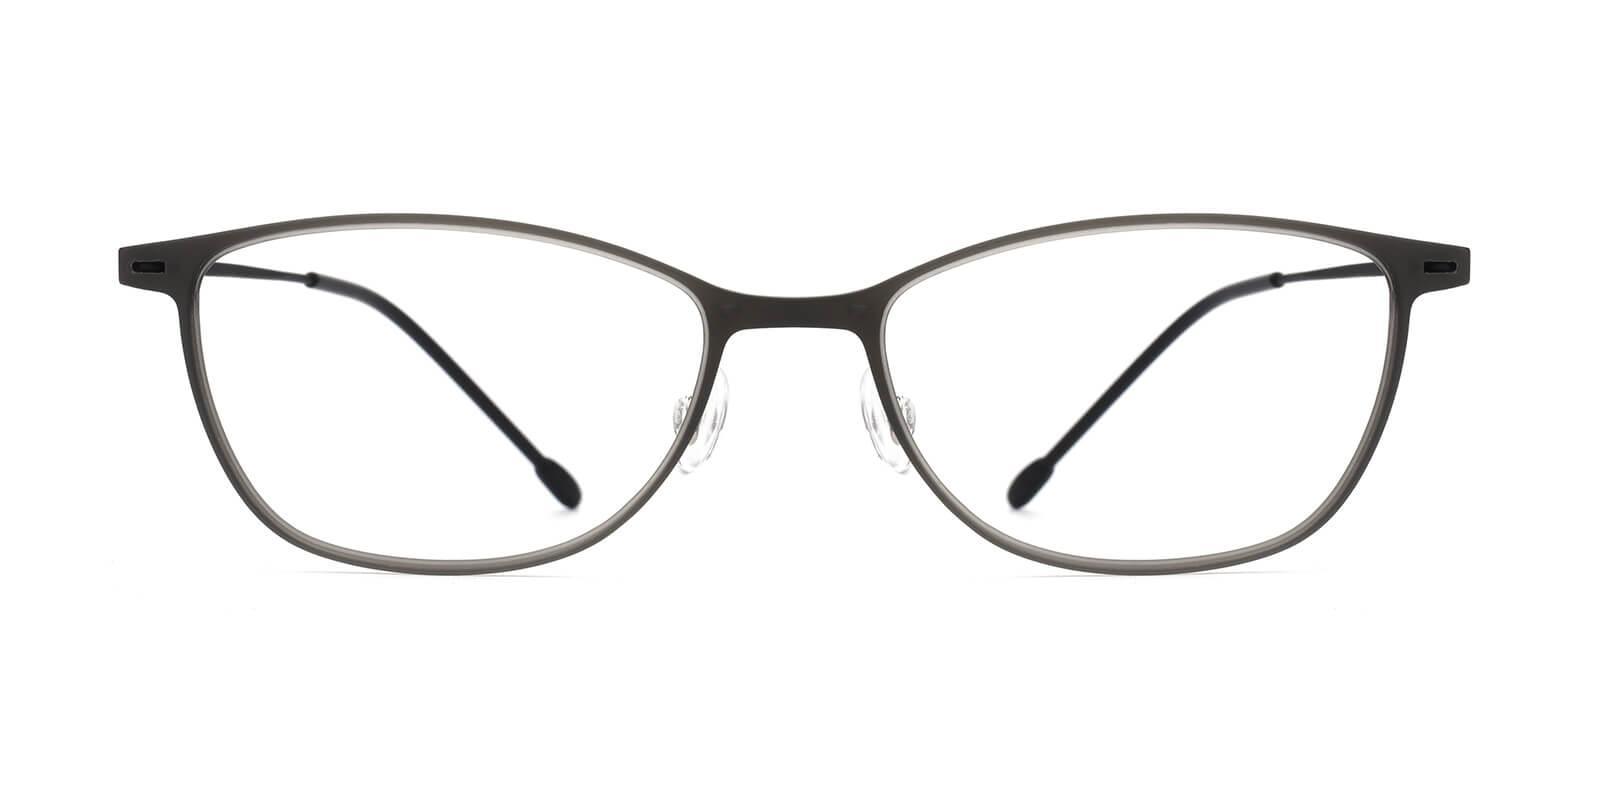 Pridgen-Gray-Rectangle / Cat-Combination-Eyeglasses-additional2